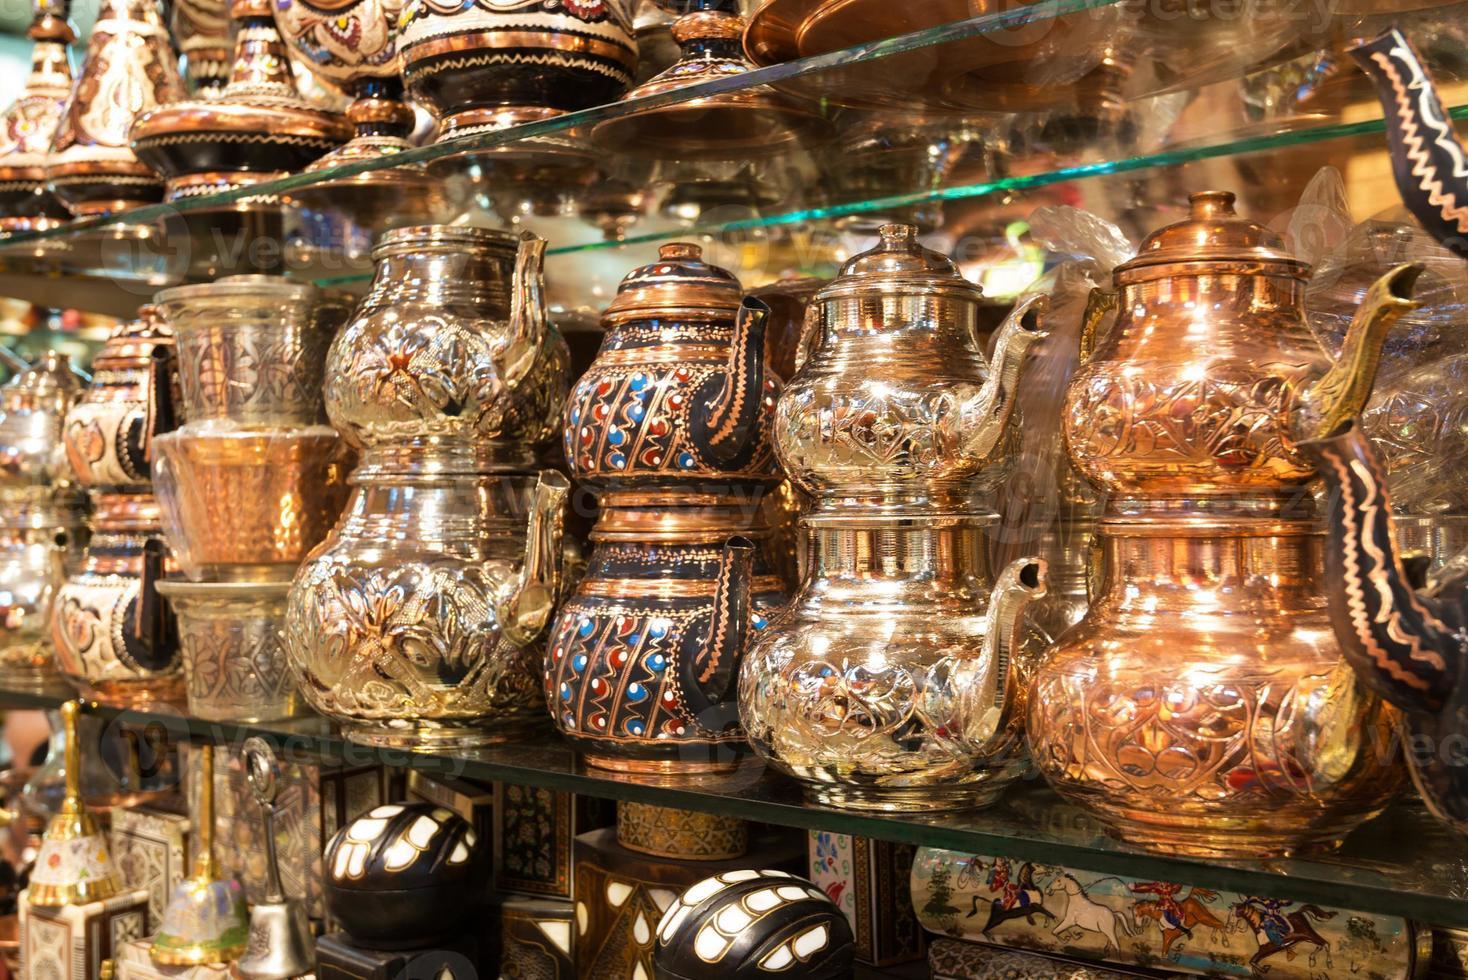 piatti orientali per il tè venduti al Grand Bazaar foto